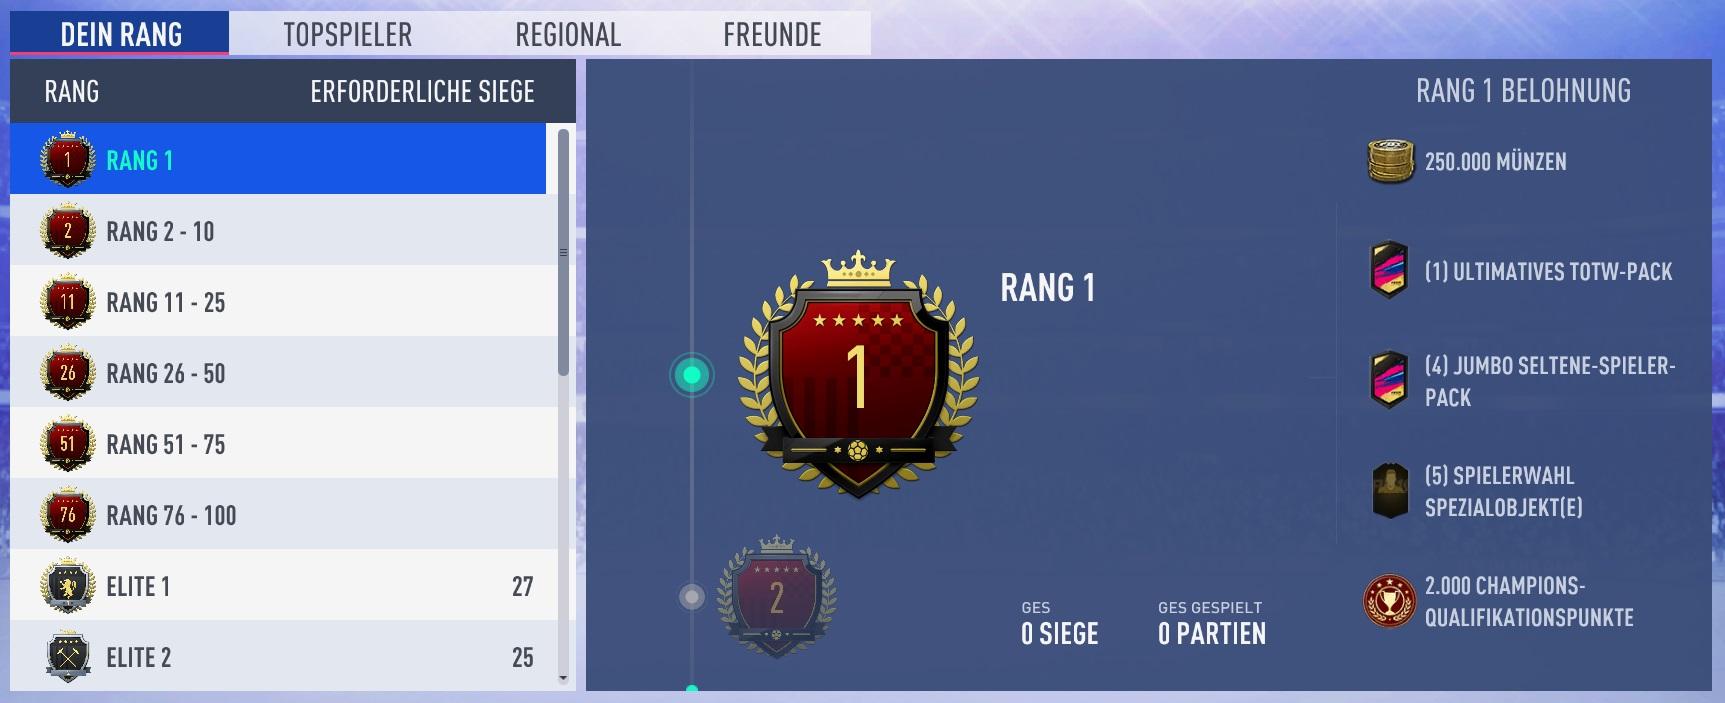 Fut champs rewards